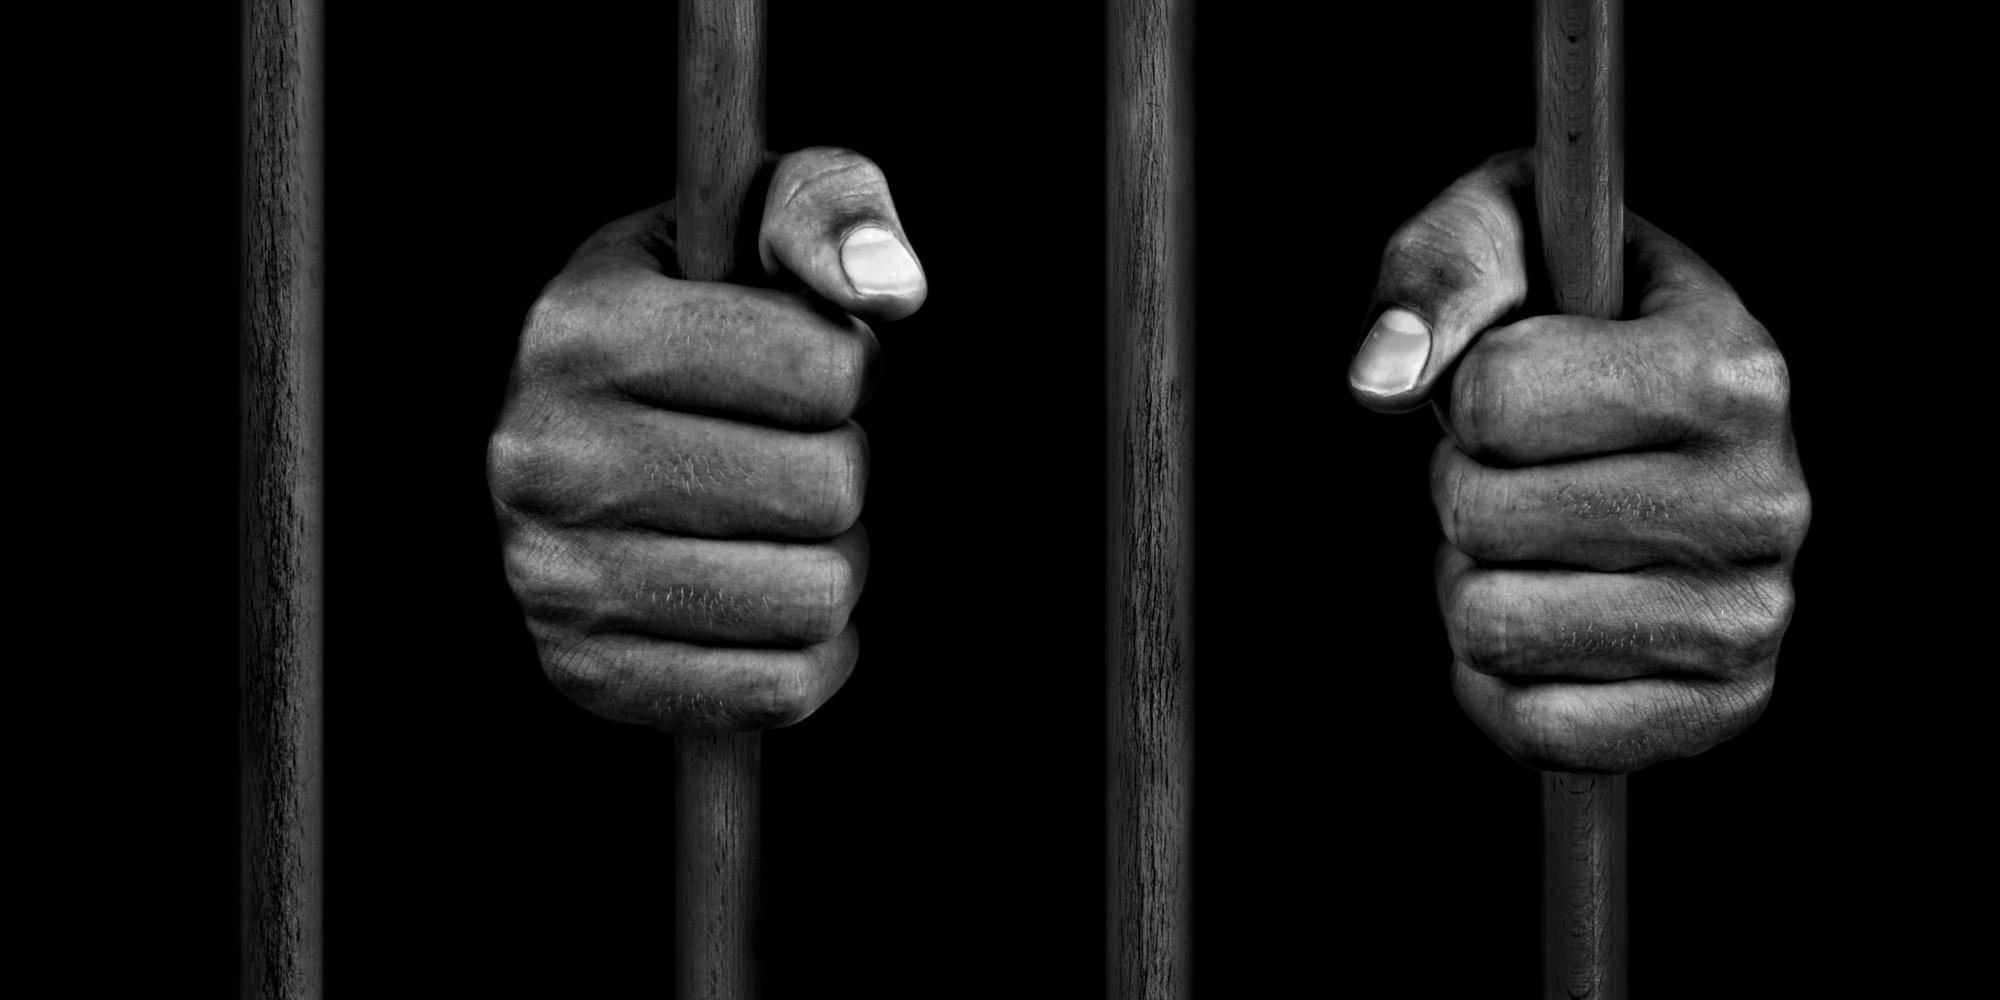 o-BLACK-PERSON-PRISON-facebook.jpg